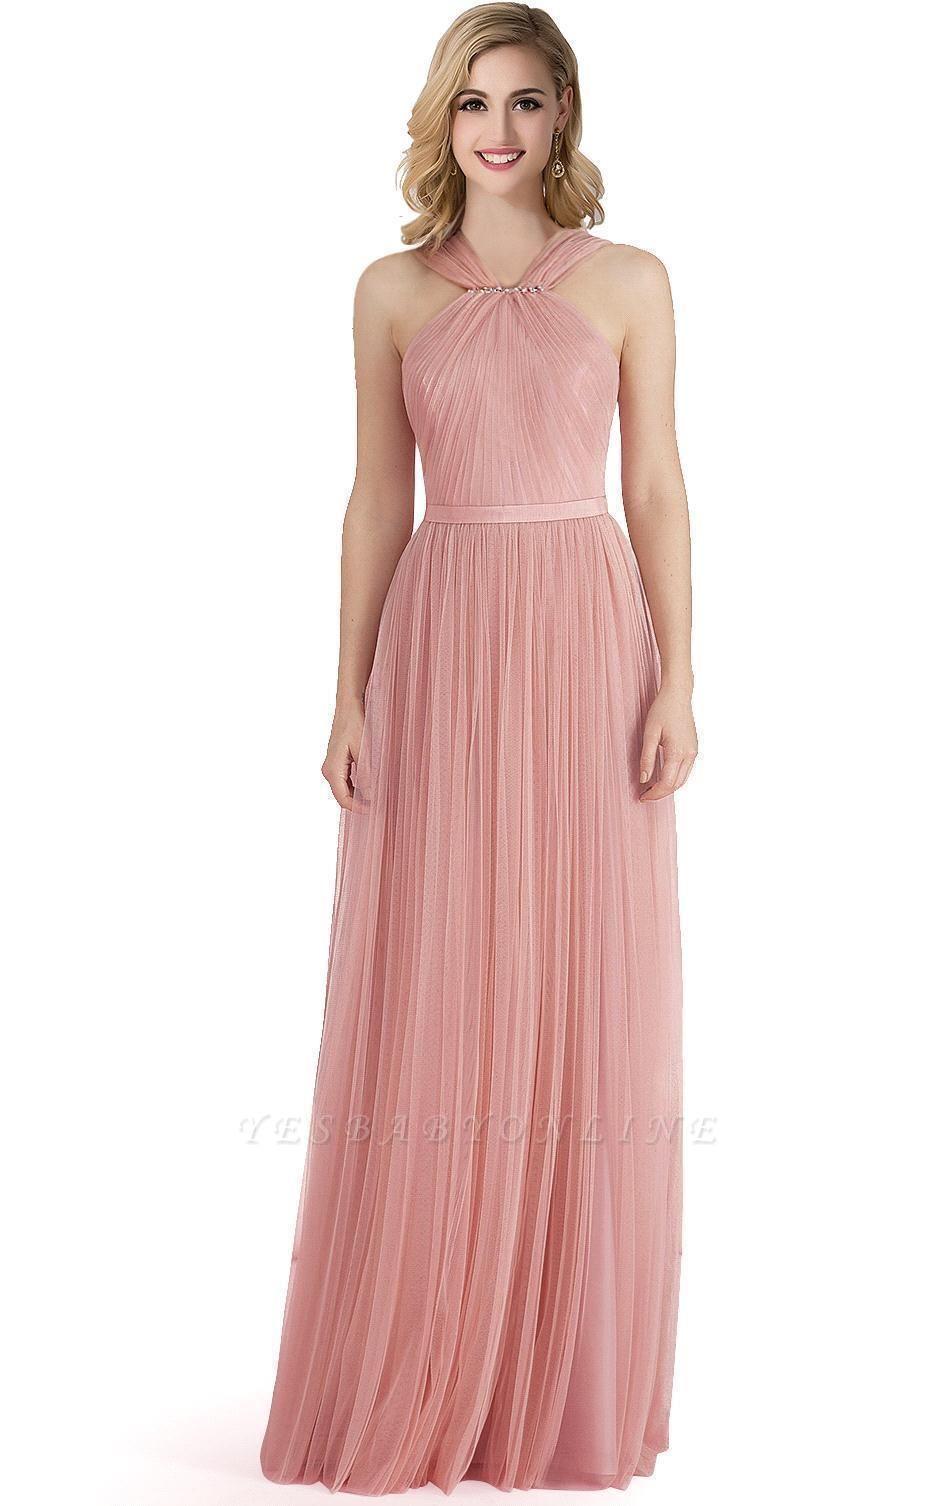 Cheap Sheath Pink Tulle Ribbon Sash Simple Bridesmaid Dress in Stock